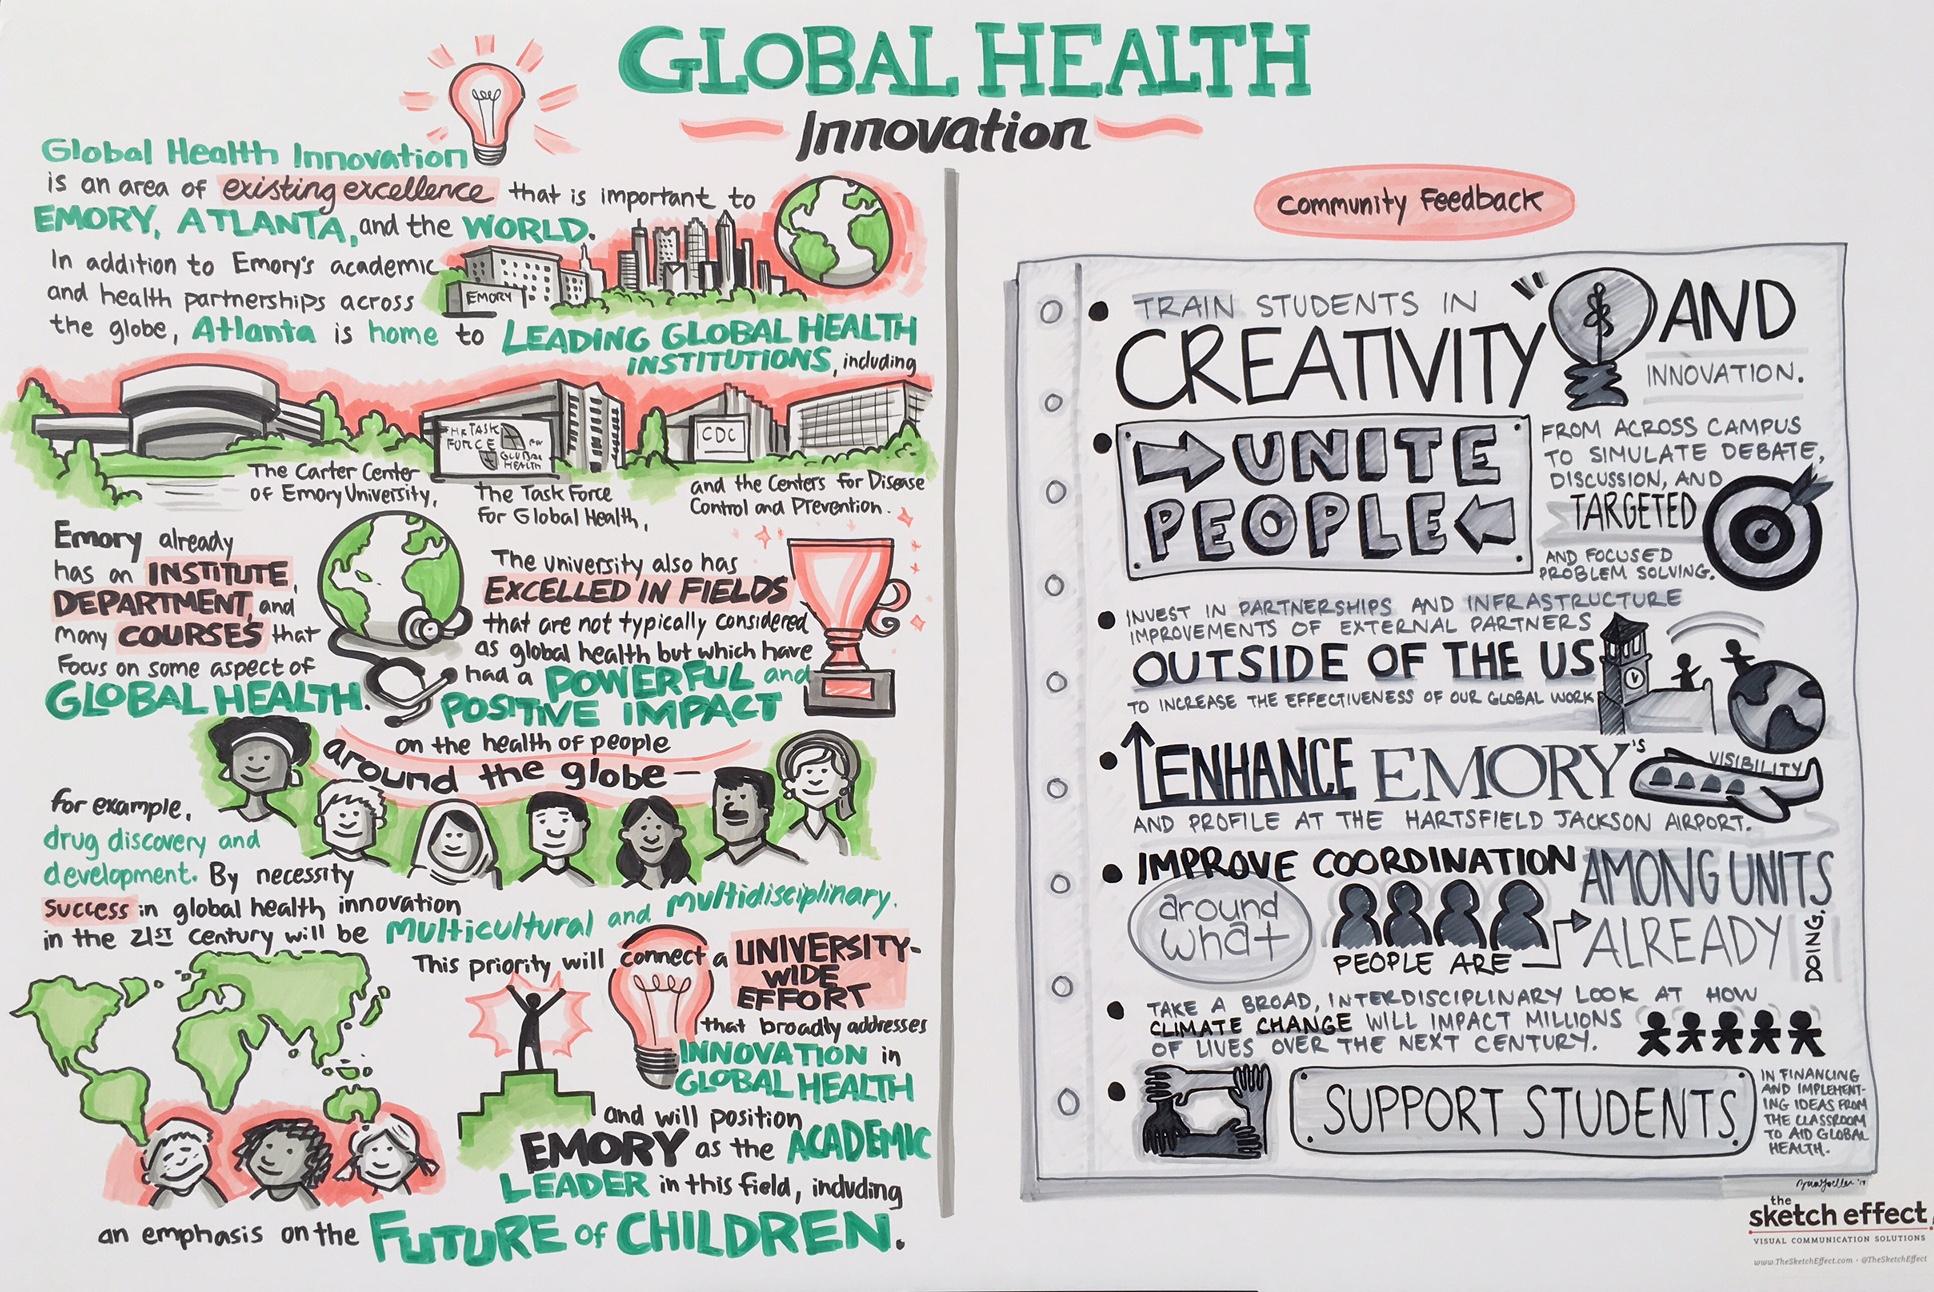 Global Health Innovation